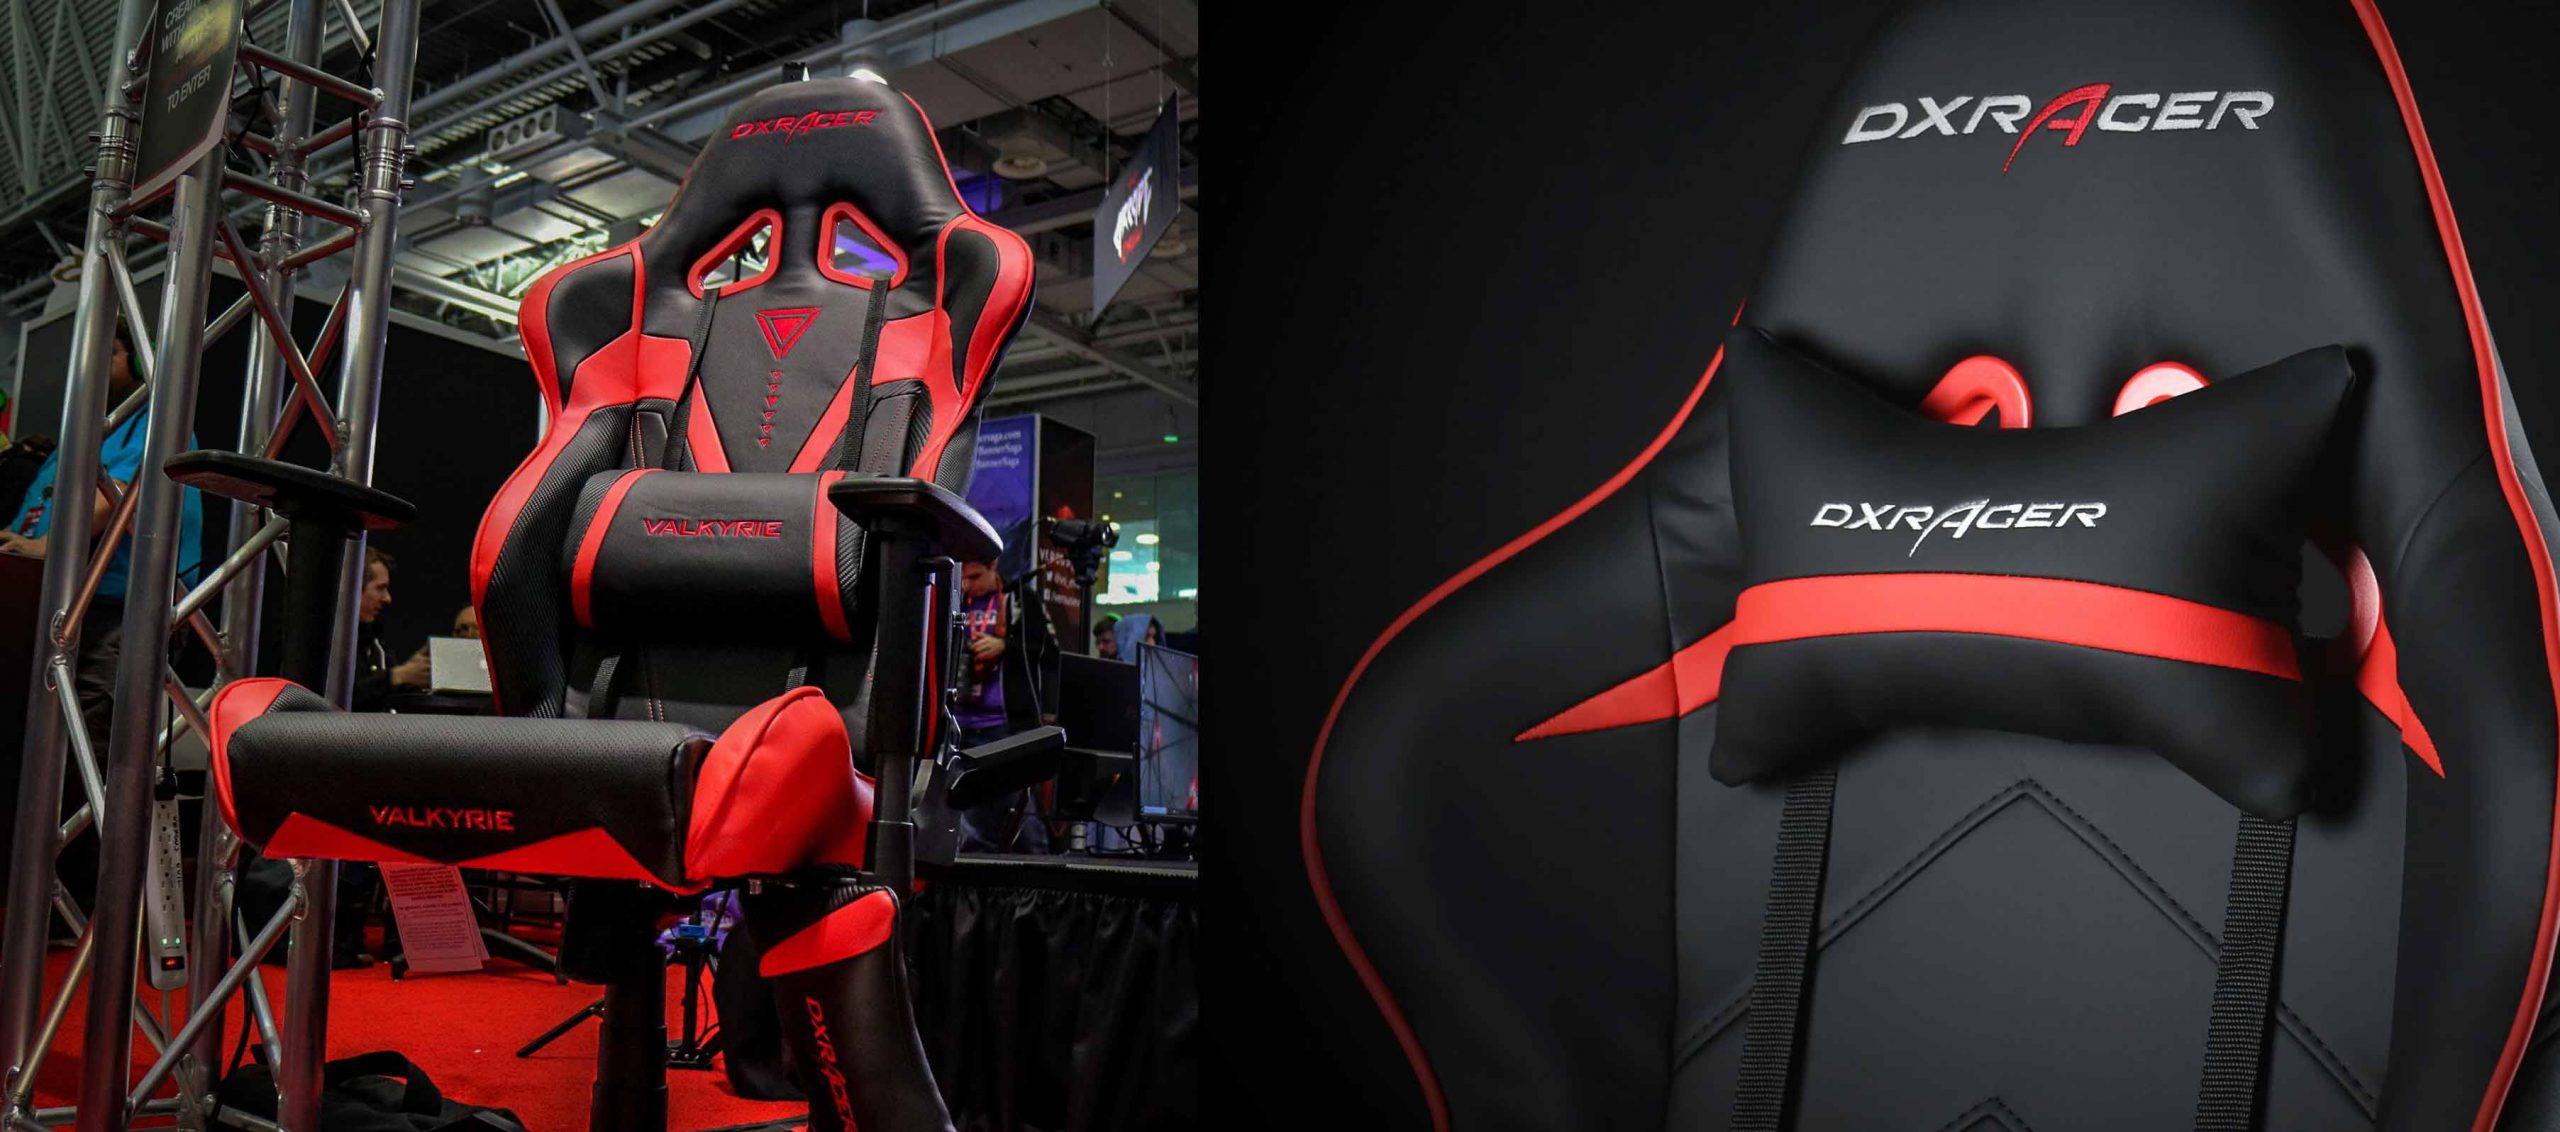 gaming chairs - dxracer gaming chair - gaming - chair - dxracer professional gamer chair - صندلی های بازی -